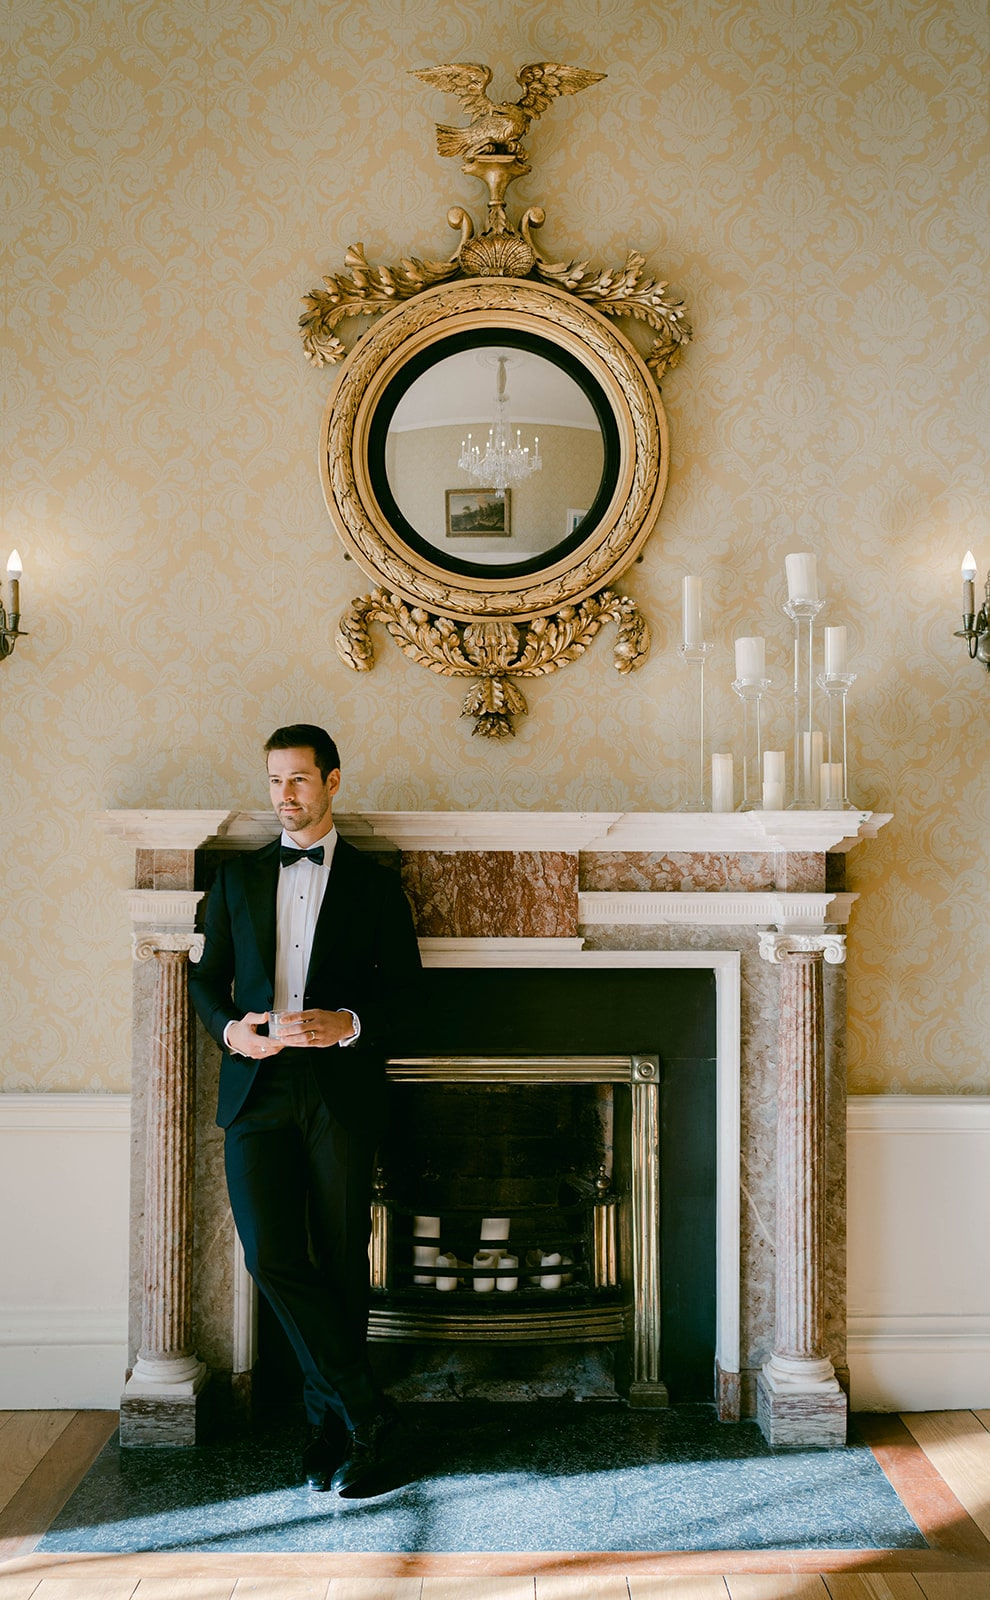 Museum of Literature Ireland wedding groom in black tux